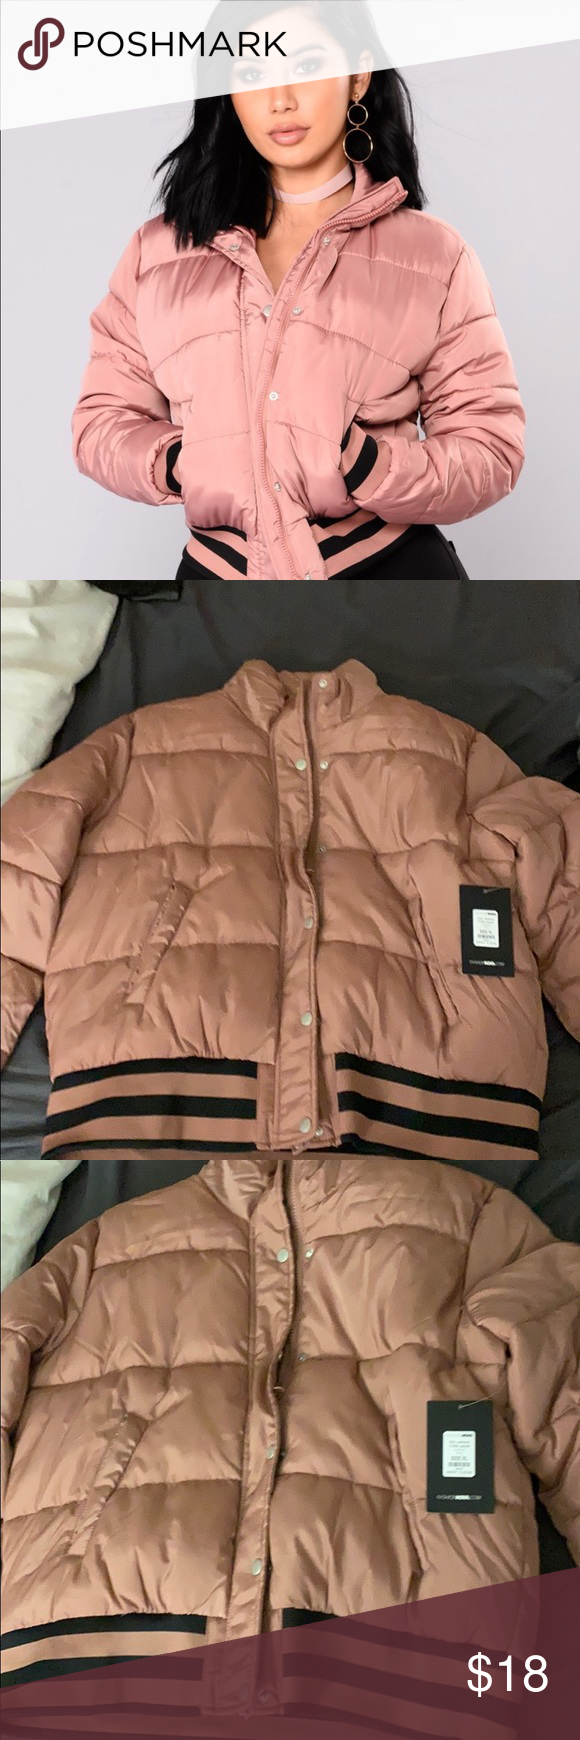 Fashion Nova Puffer Jacket Puffer Jacket Style Fashion Nova Fashion [ 1740 x 580 Pixel ]